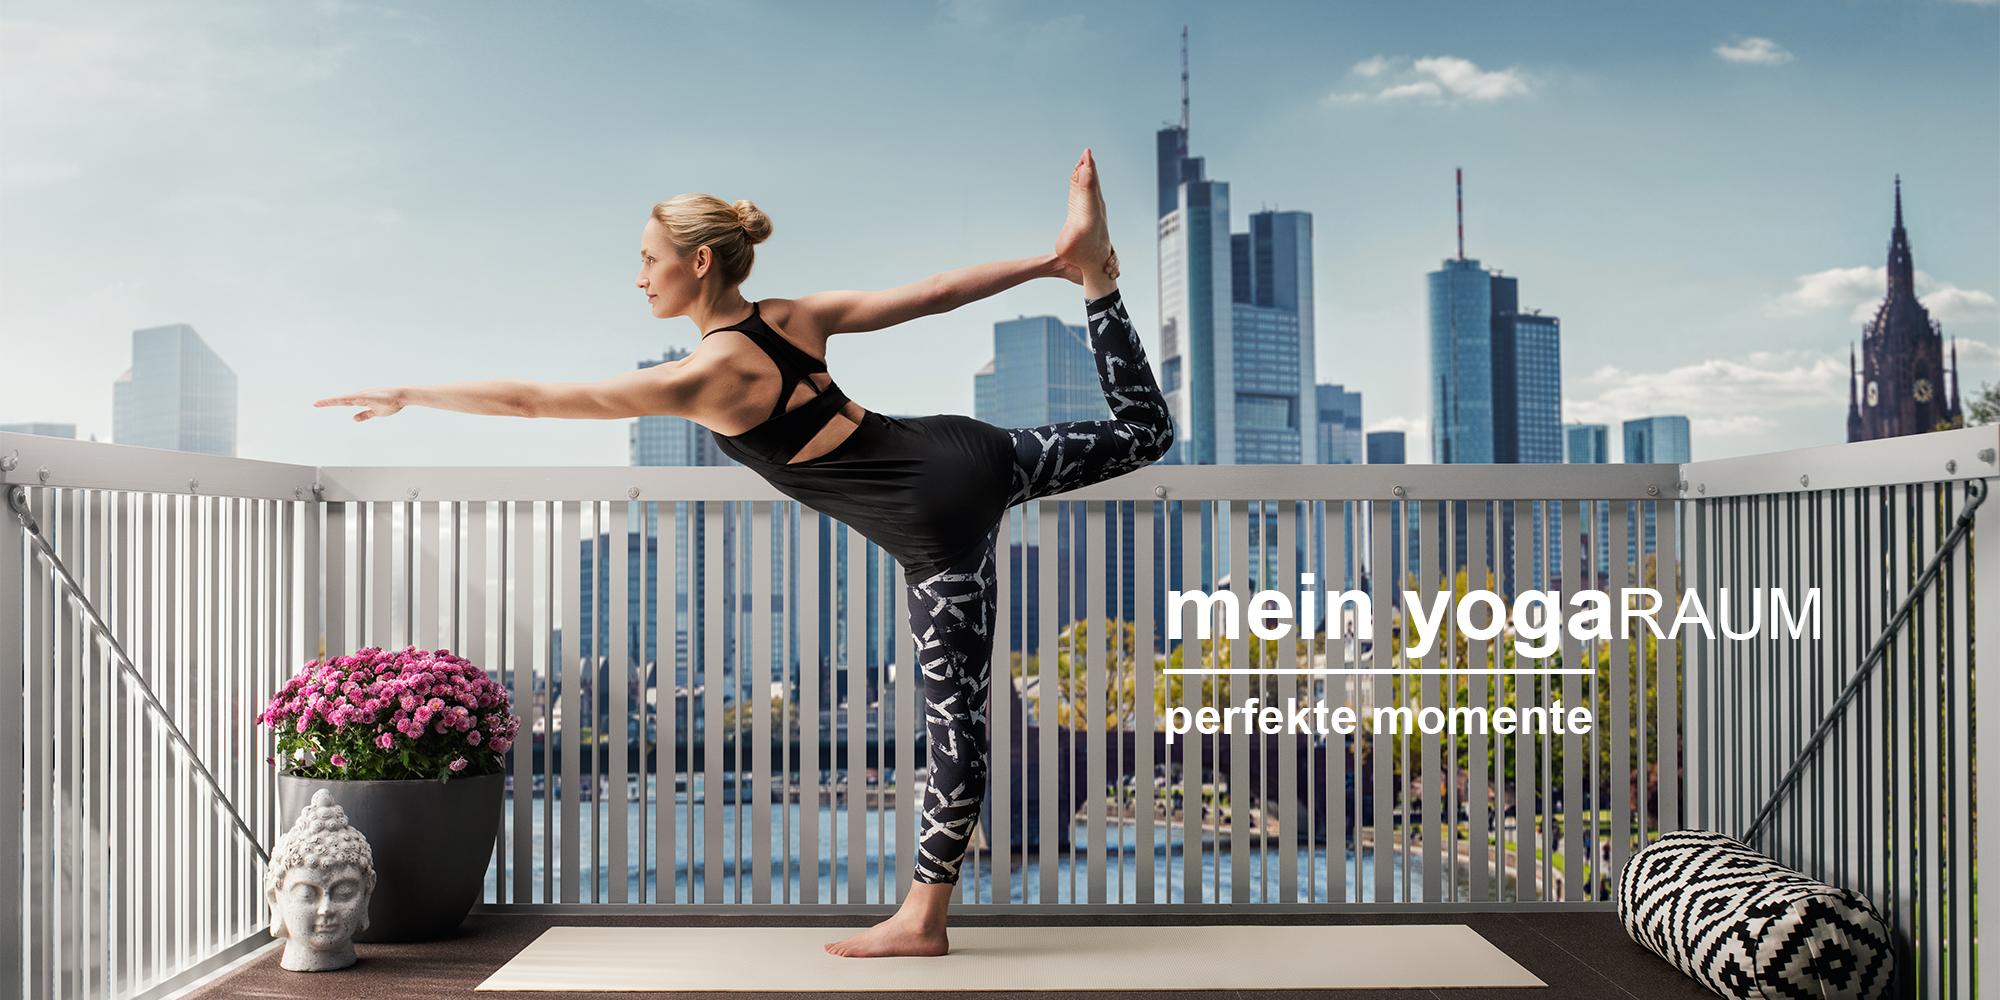 mein yogaraum - perfekte momente